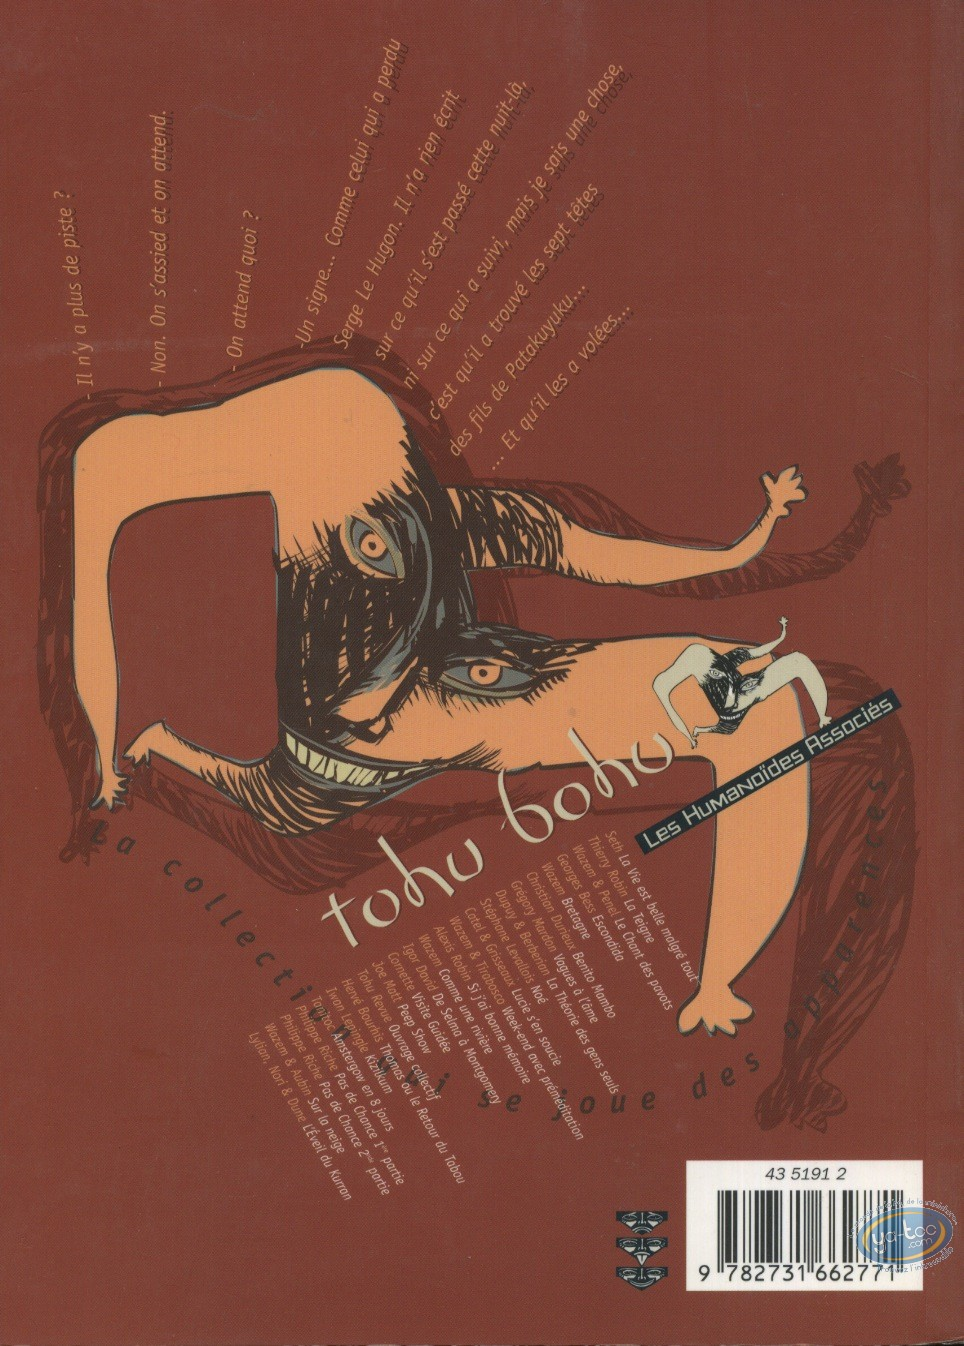 Reduced price European comic books, Tohu Bohu : Bad luck 2nd part - Tohu Bohu Collection